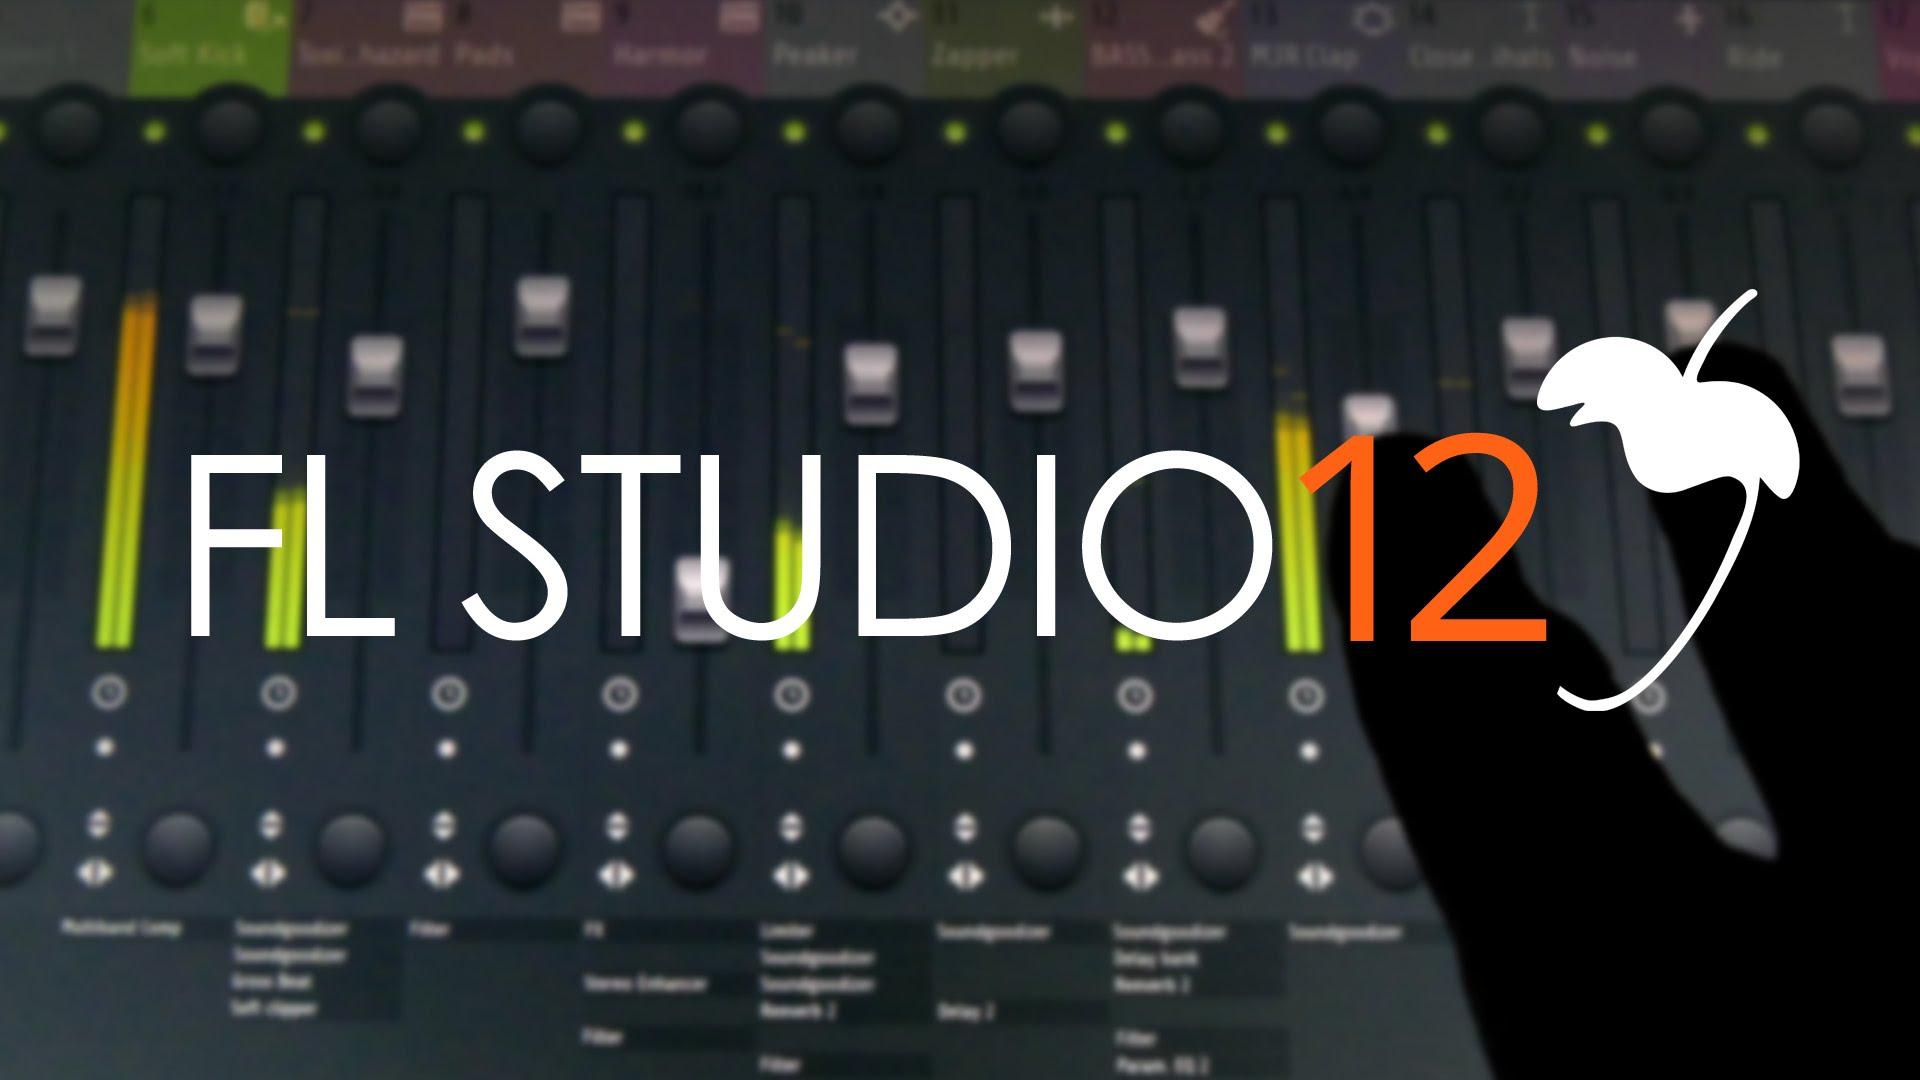 Fique por dentro do FL Studio 12 afrojack, Avicii, fl studio, fruity loops, image line, Martin Garrix, OLIVER HELDENS, Ummet Ozcan